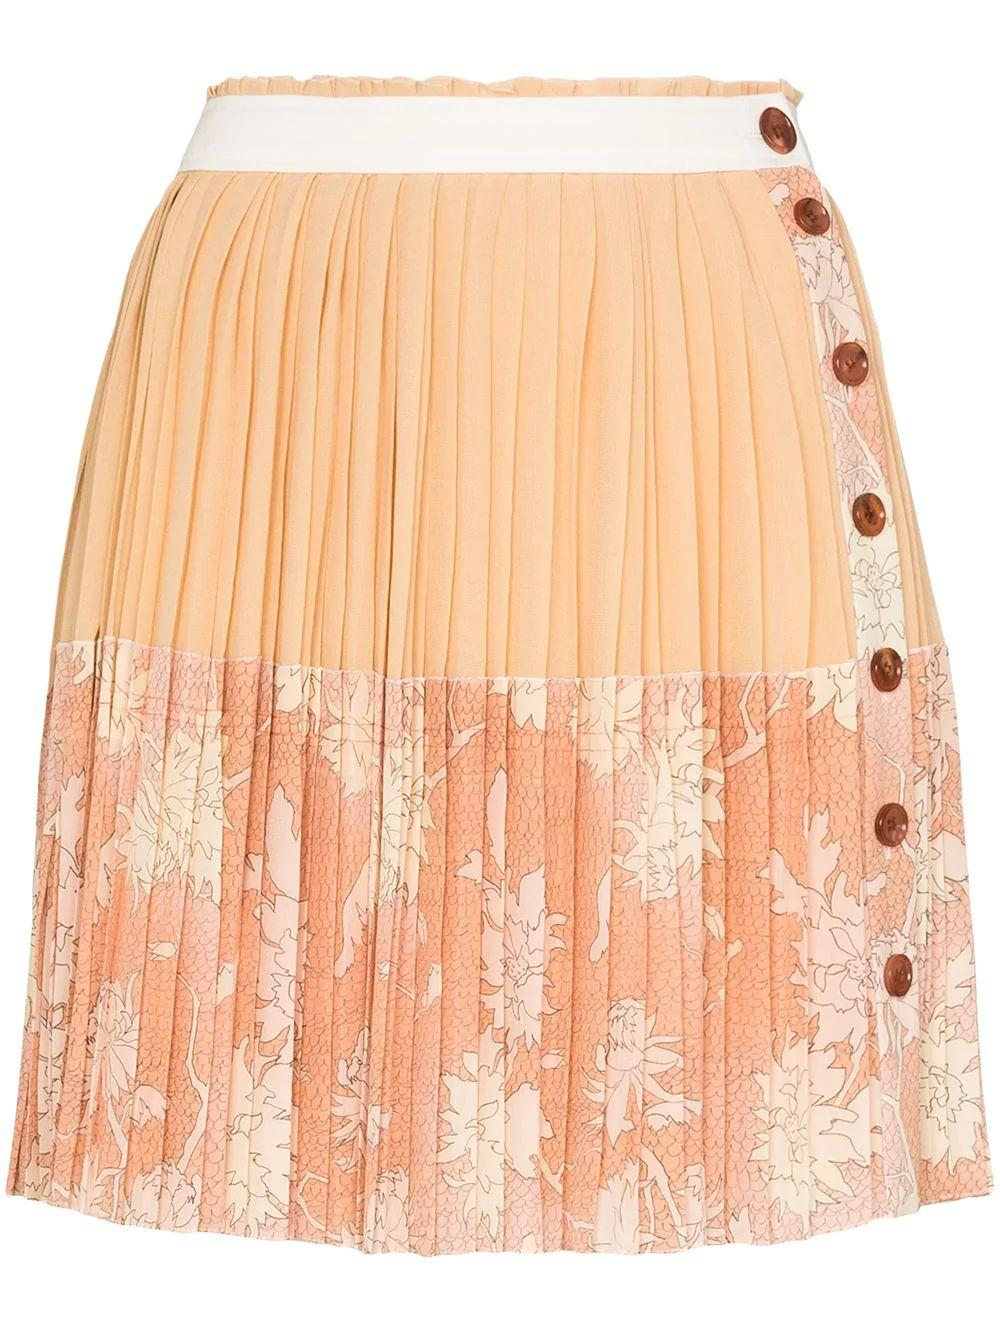 Scale Print Crepe De Chine Skirt Item # CHC20SJU04330